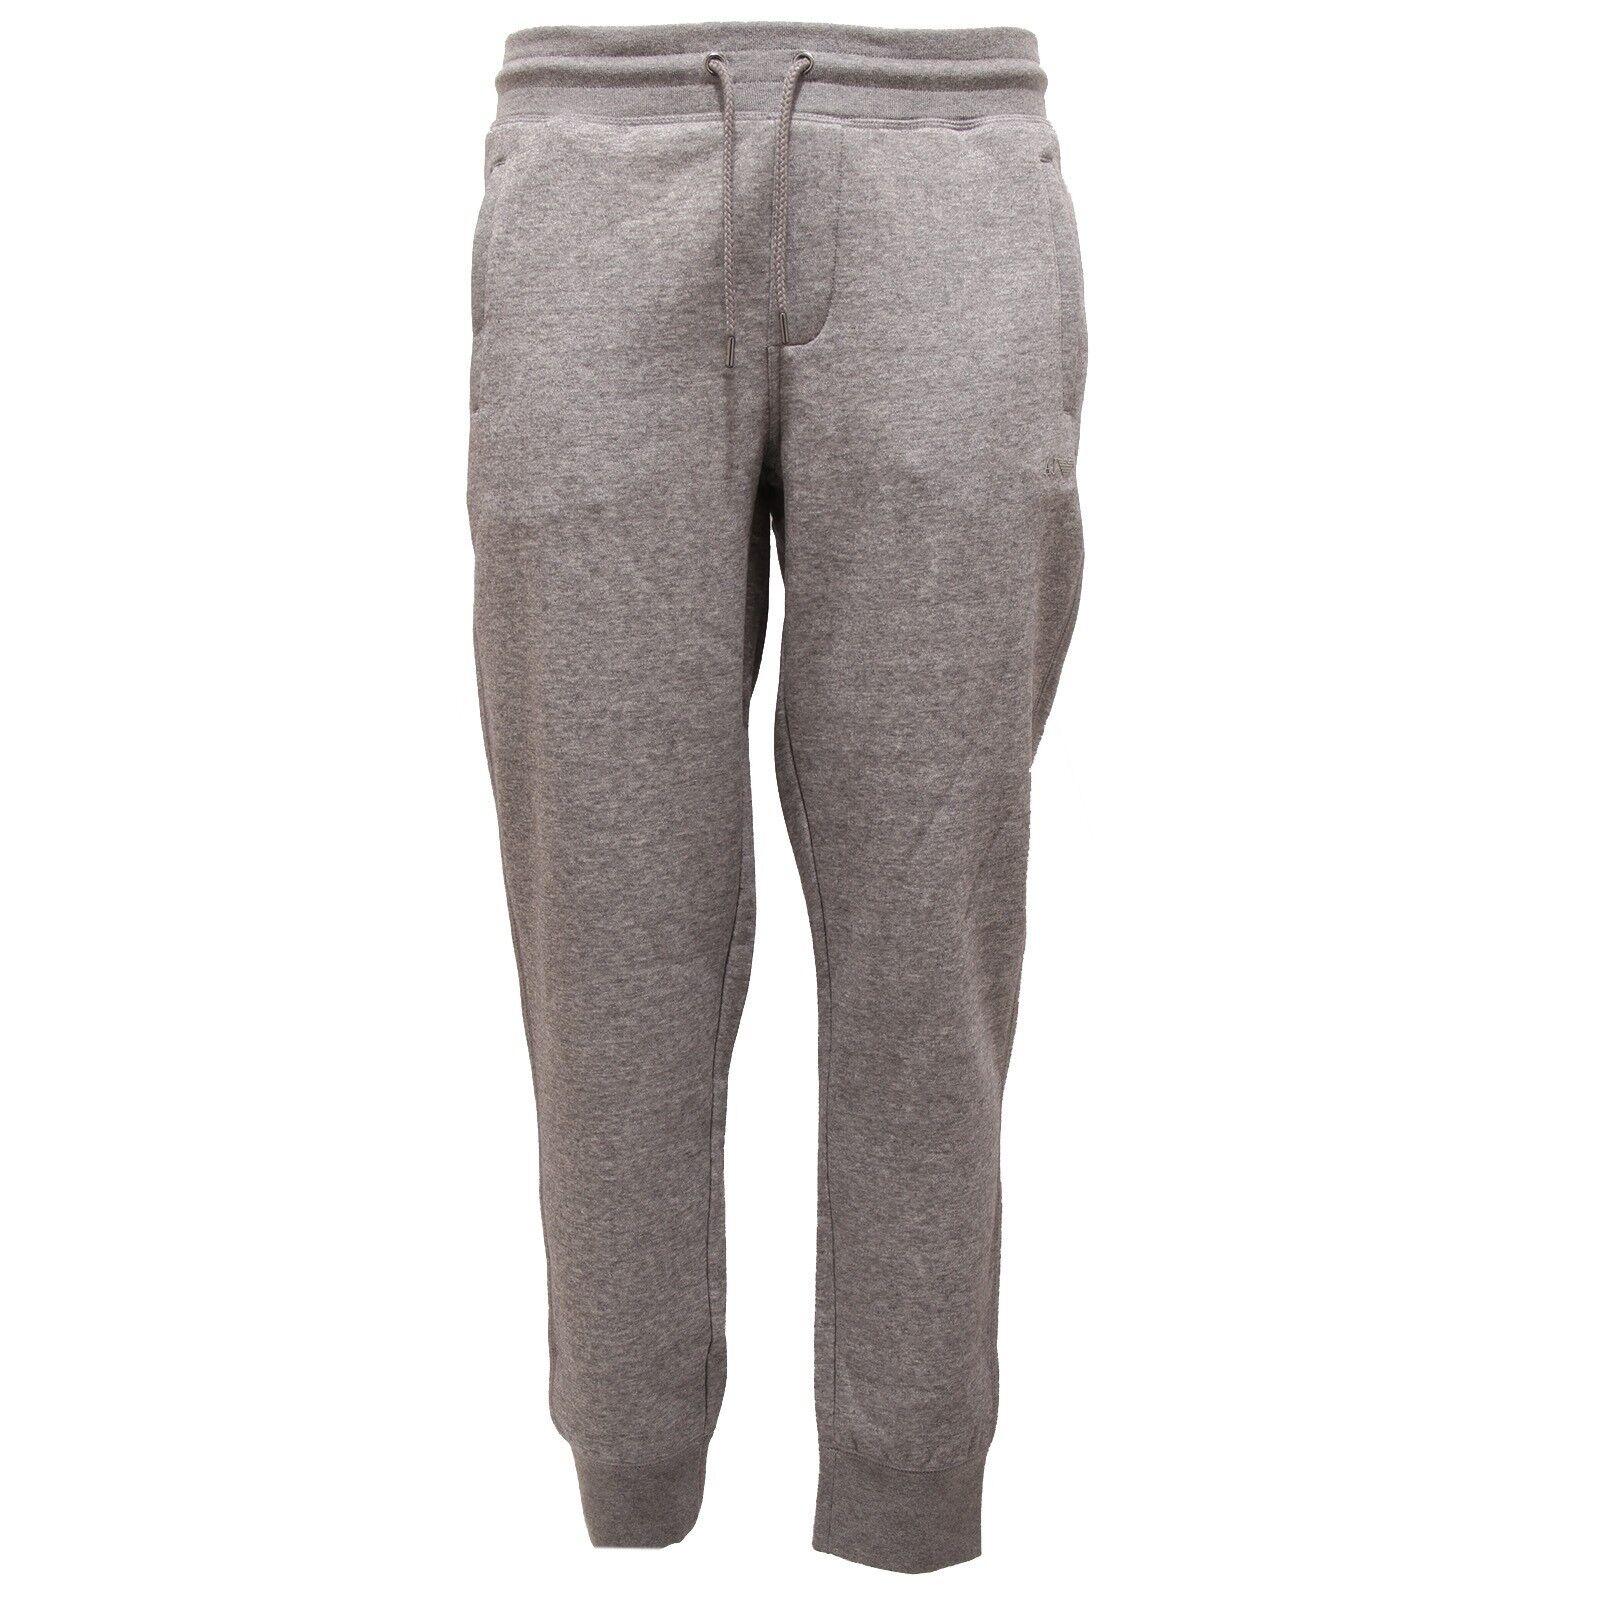 3476T pantalone uomo ARMANI JEANS trouser sweatpant men